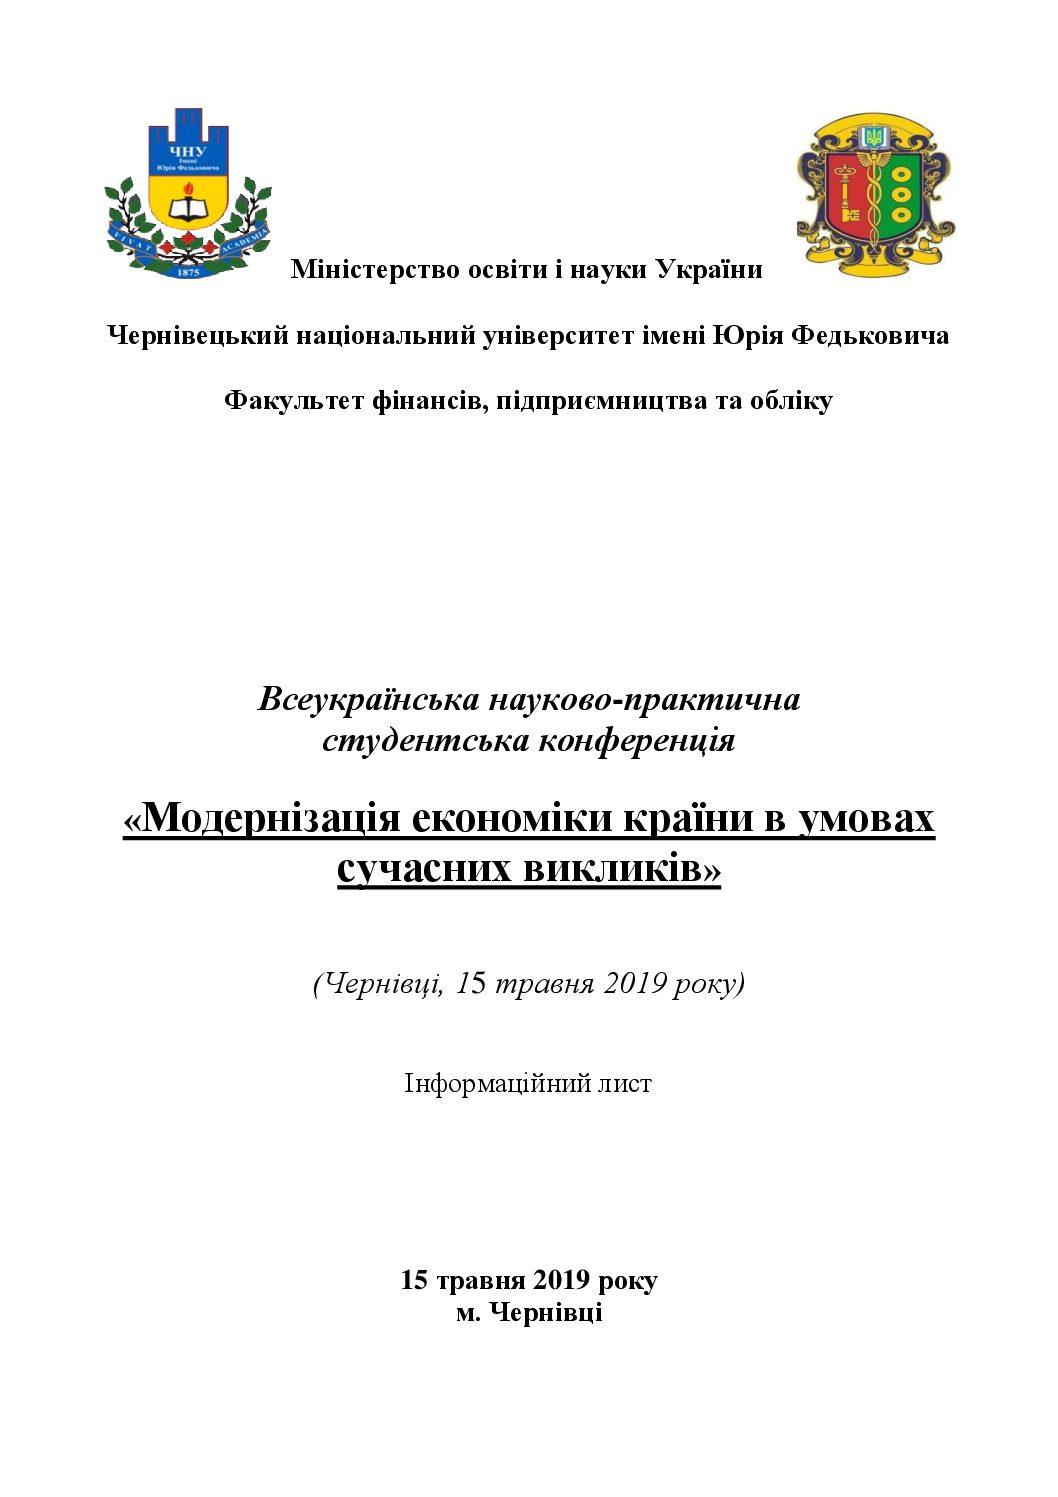 Увага! Всеукраїнська науково-практична  студентська конференція